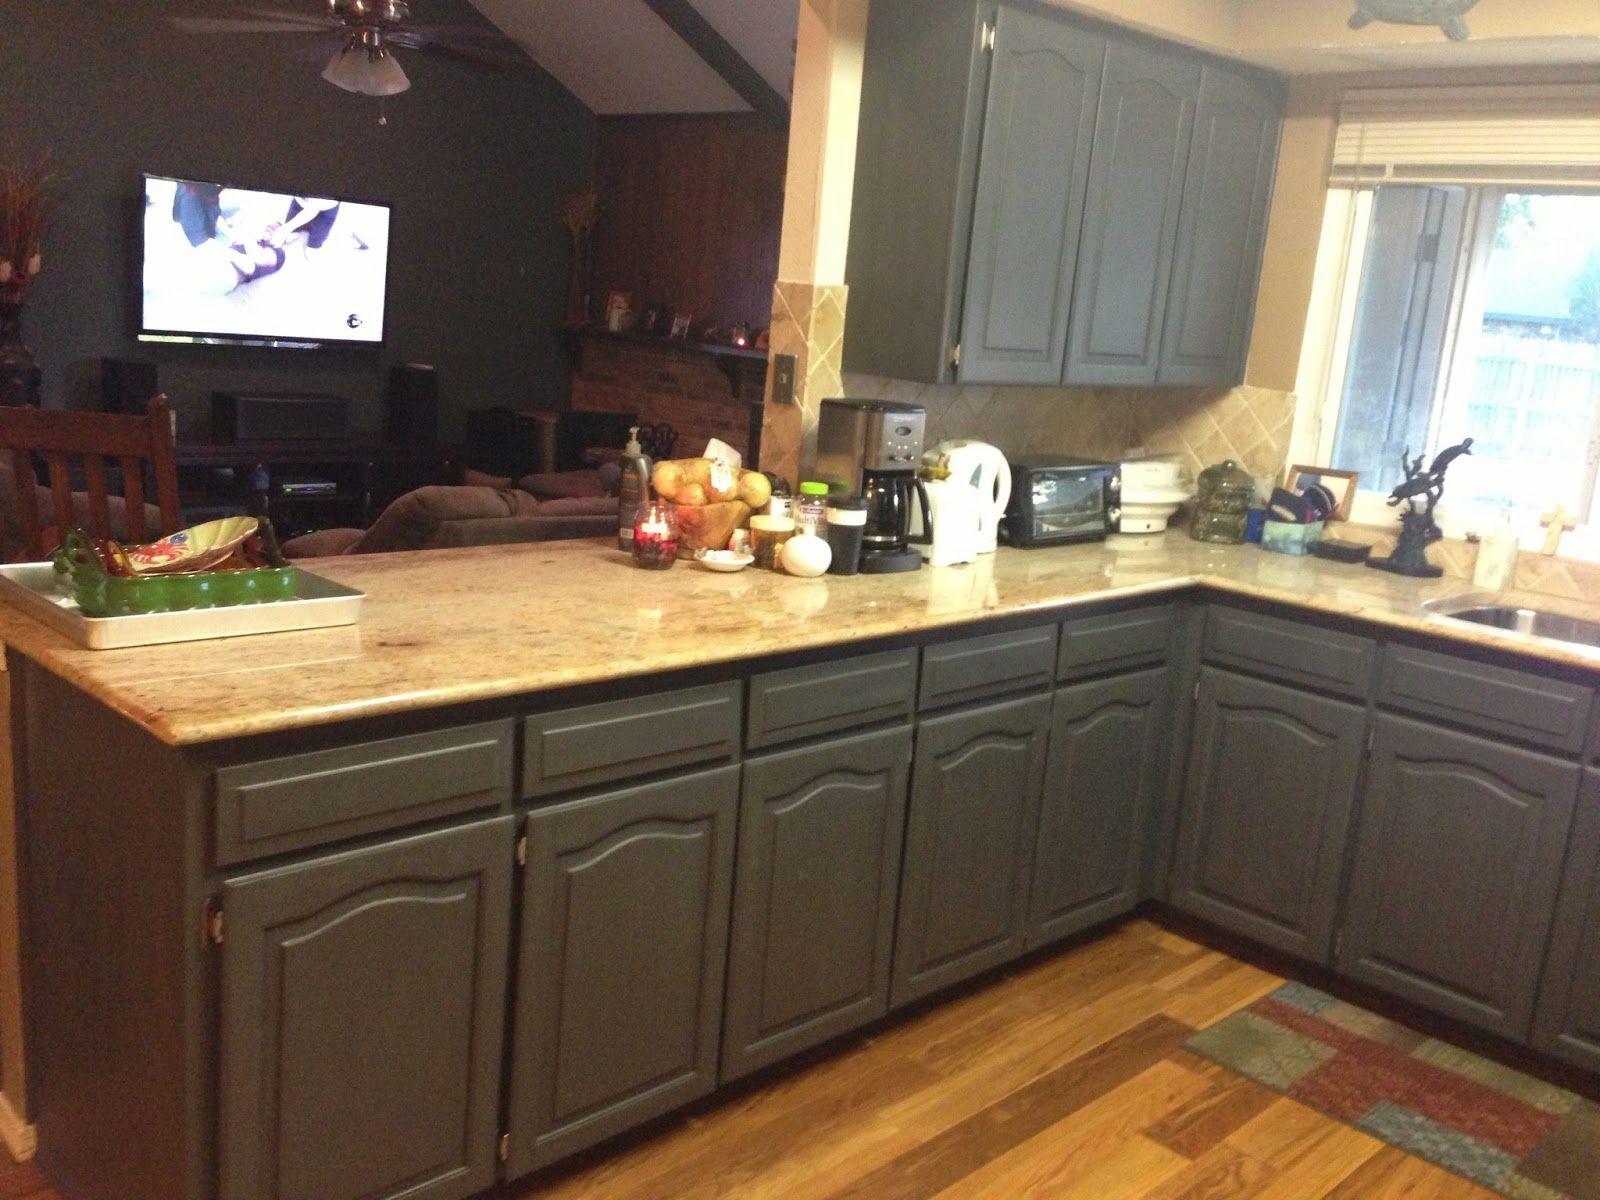 www.u-nizwa 7 2015 06 furniture-black-painted-kitchen-cabinets